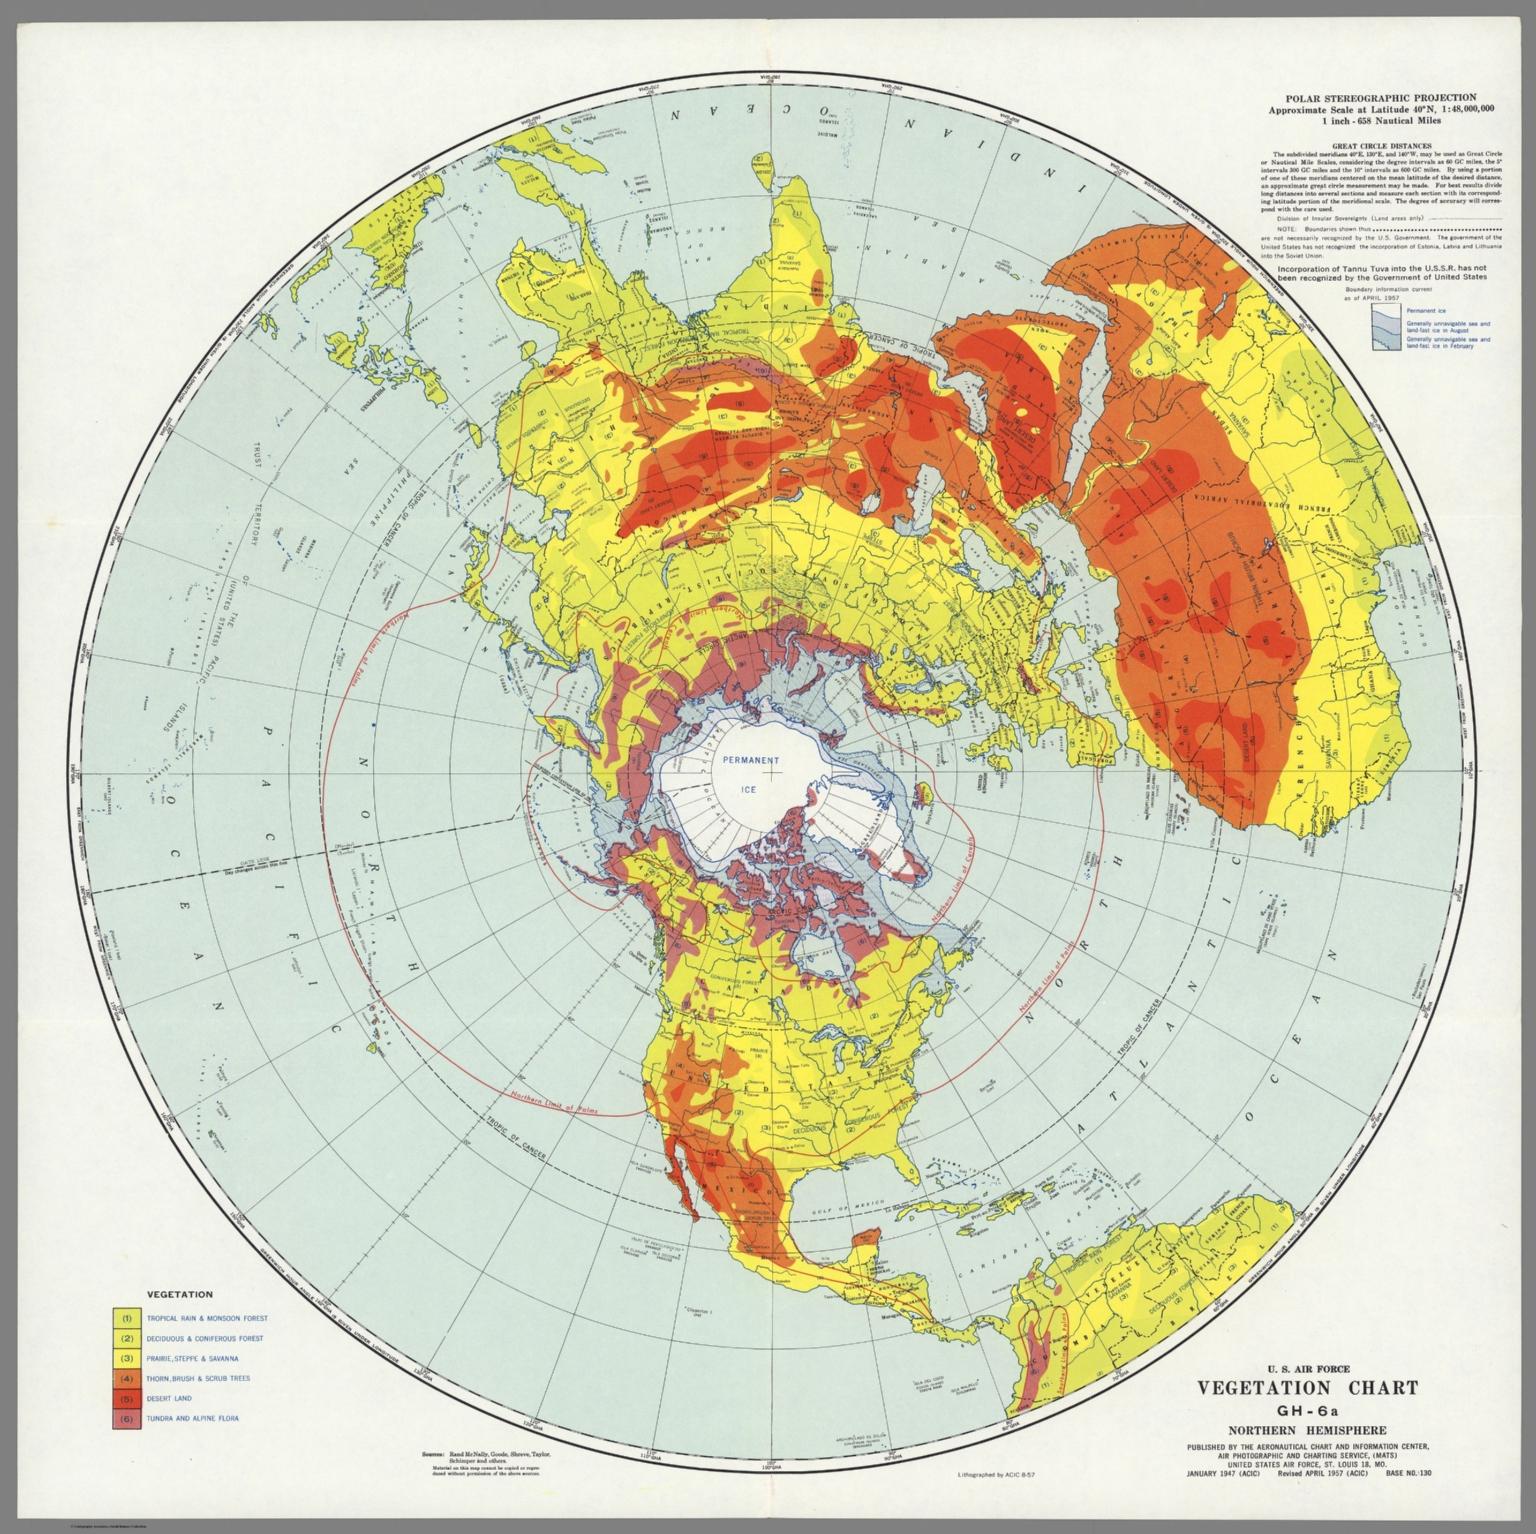 U.S. Air Force. Vegetation Chart GH-6a, Northern Hemisphere. - David ...